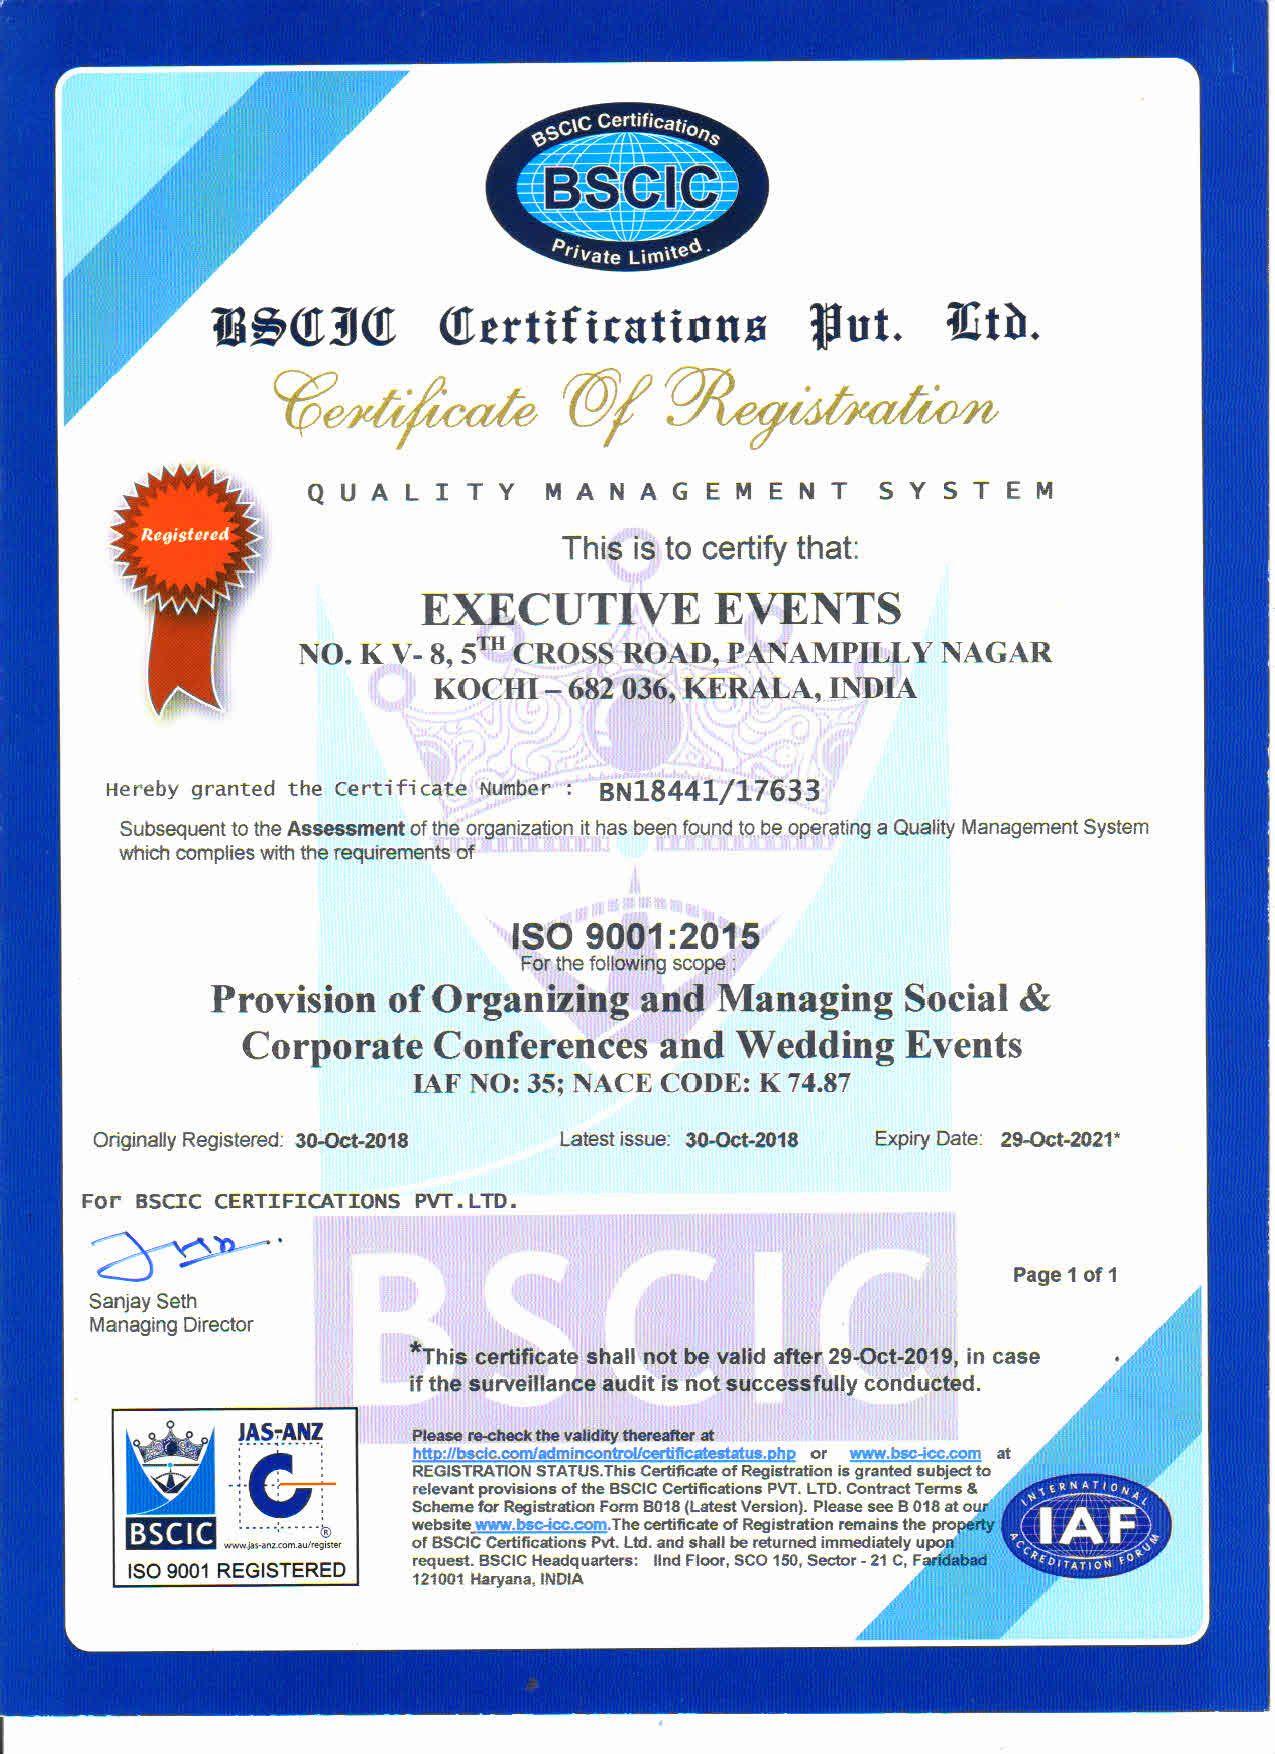 certificate event certification management bscic iso registration organization deposit